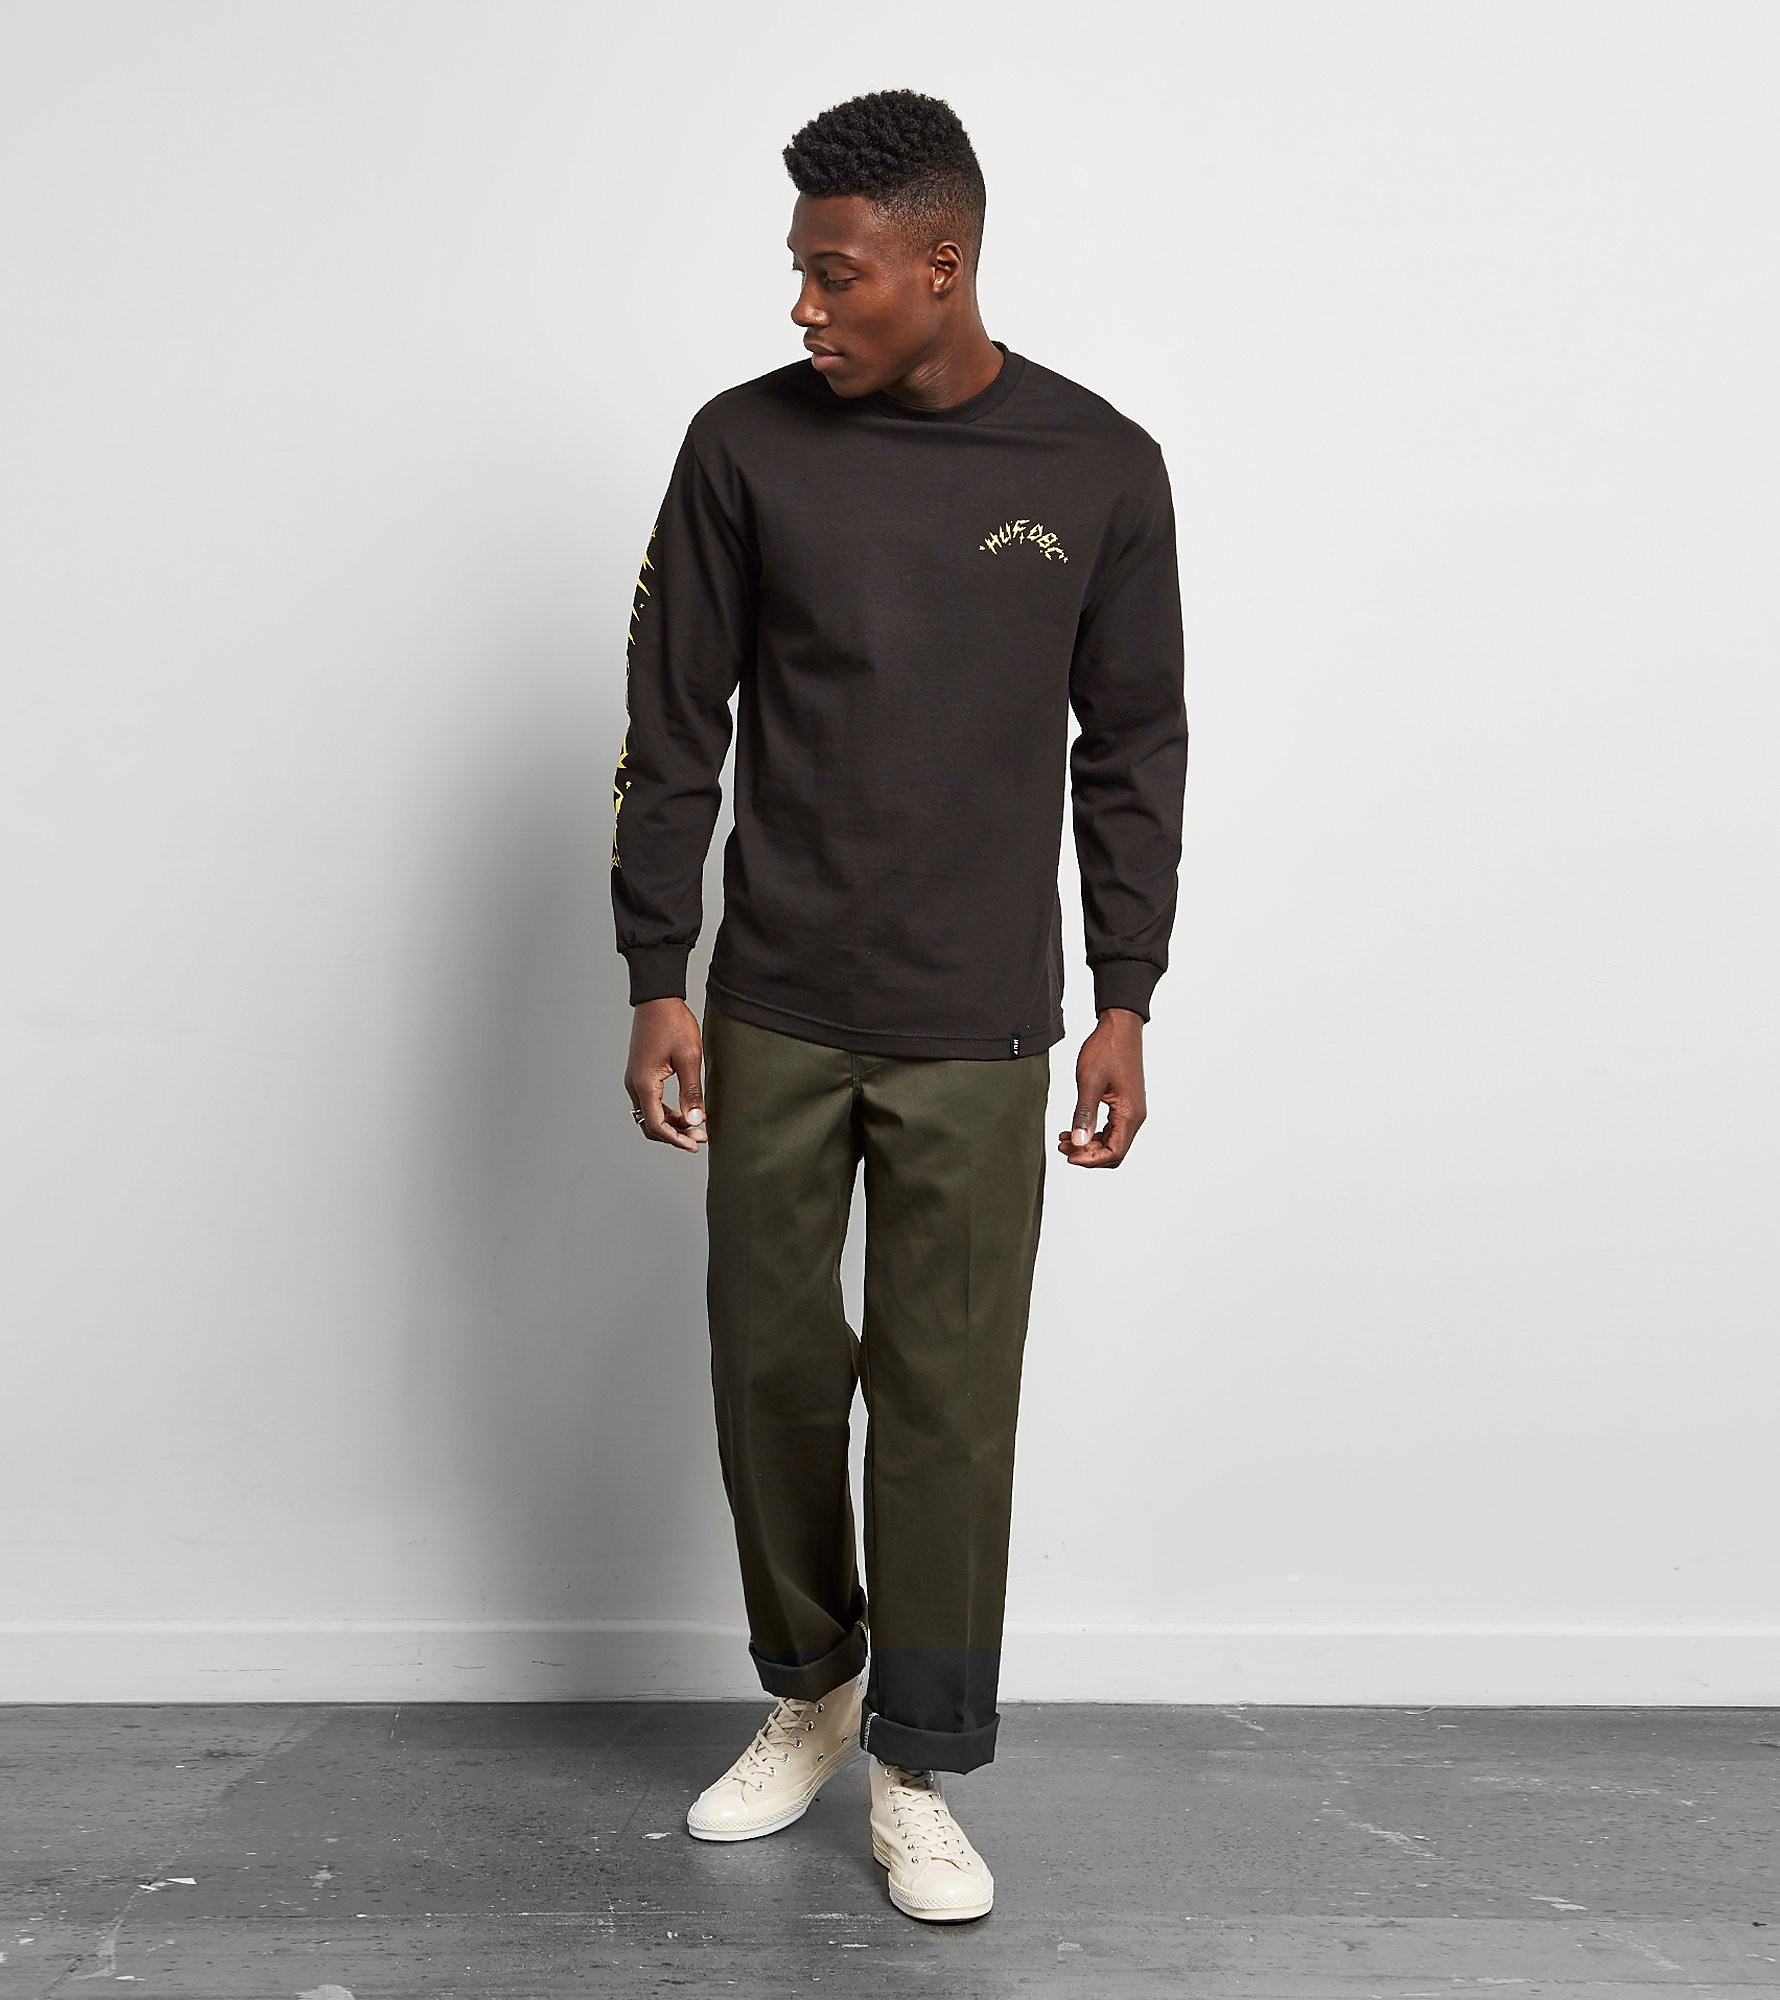 HUF Bolts Long-Sleeved T-Shirt